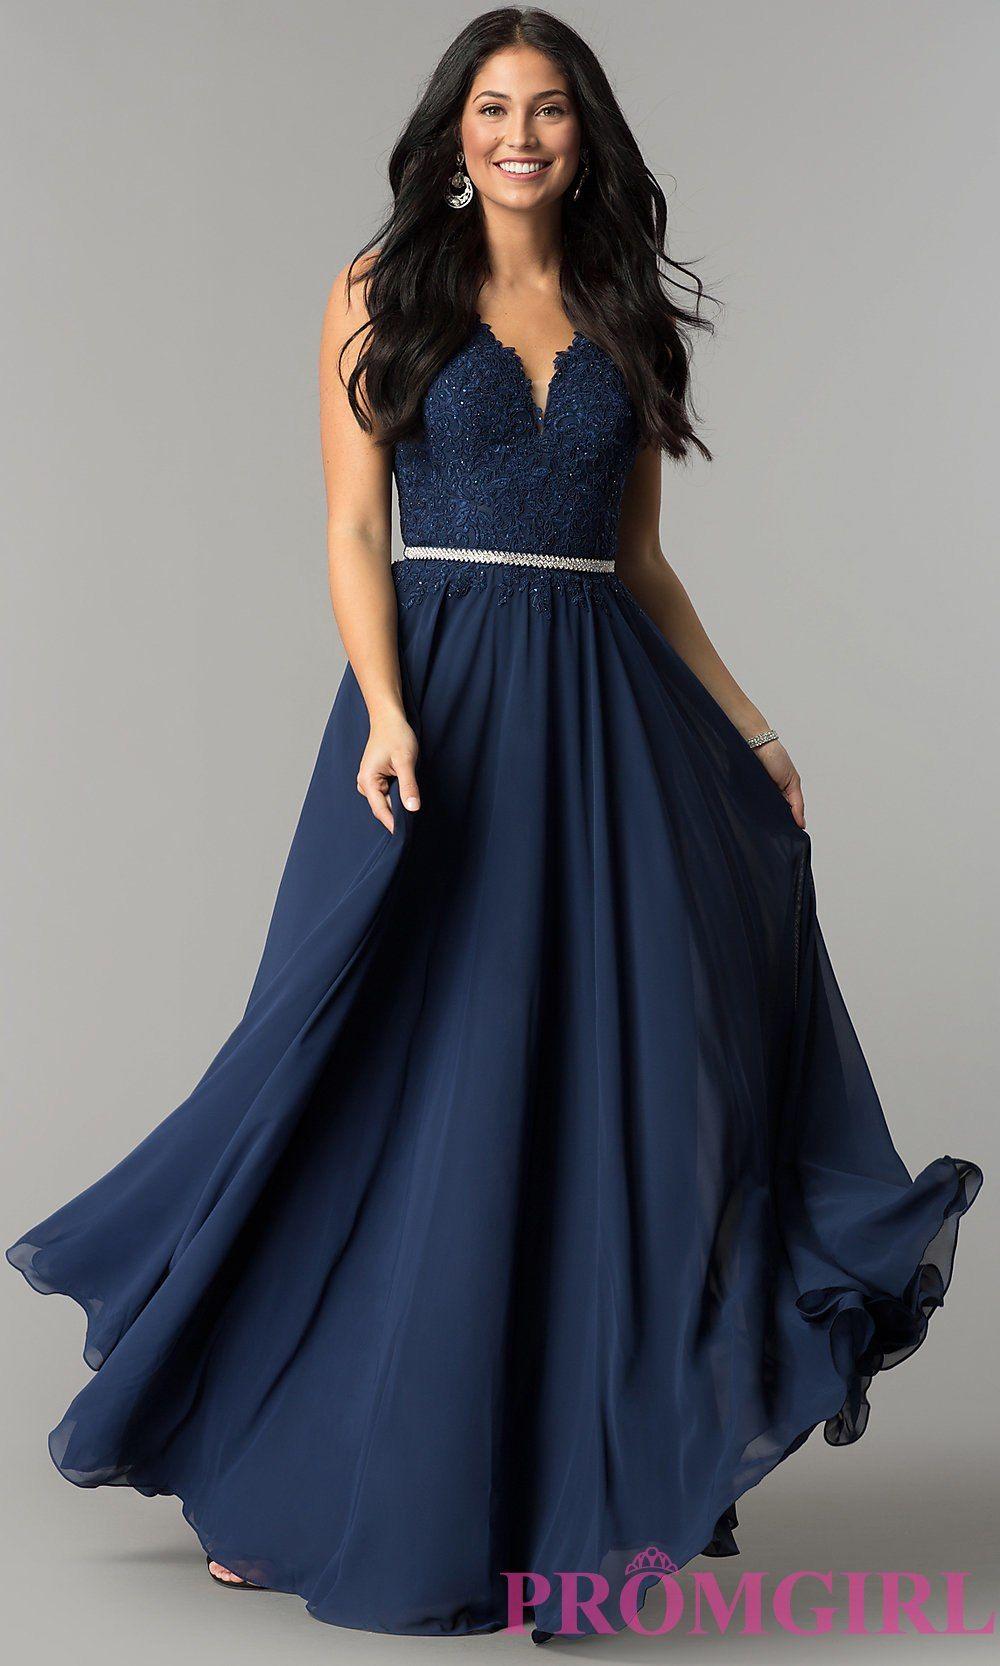 Plussize vneck chiffon long prom dress promgirl military